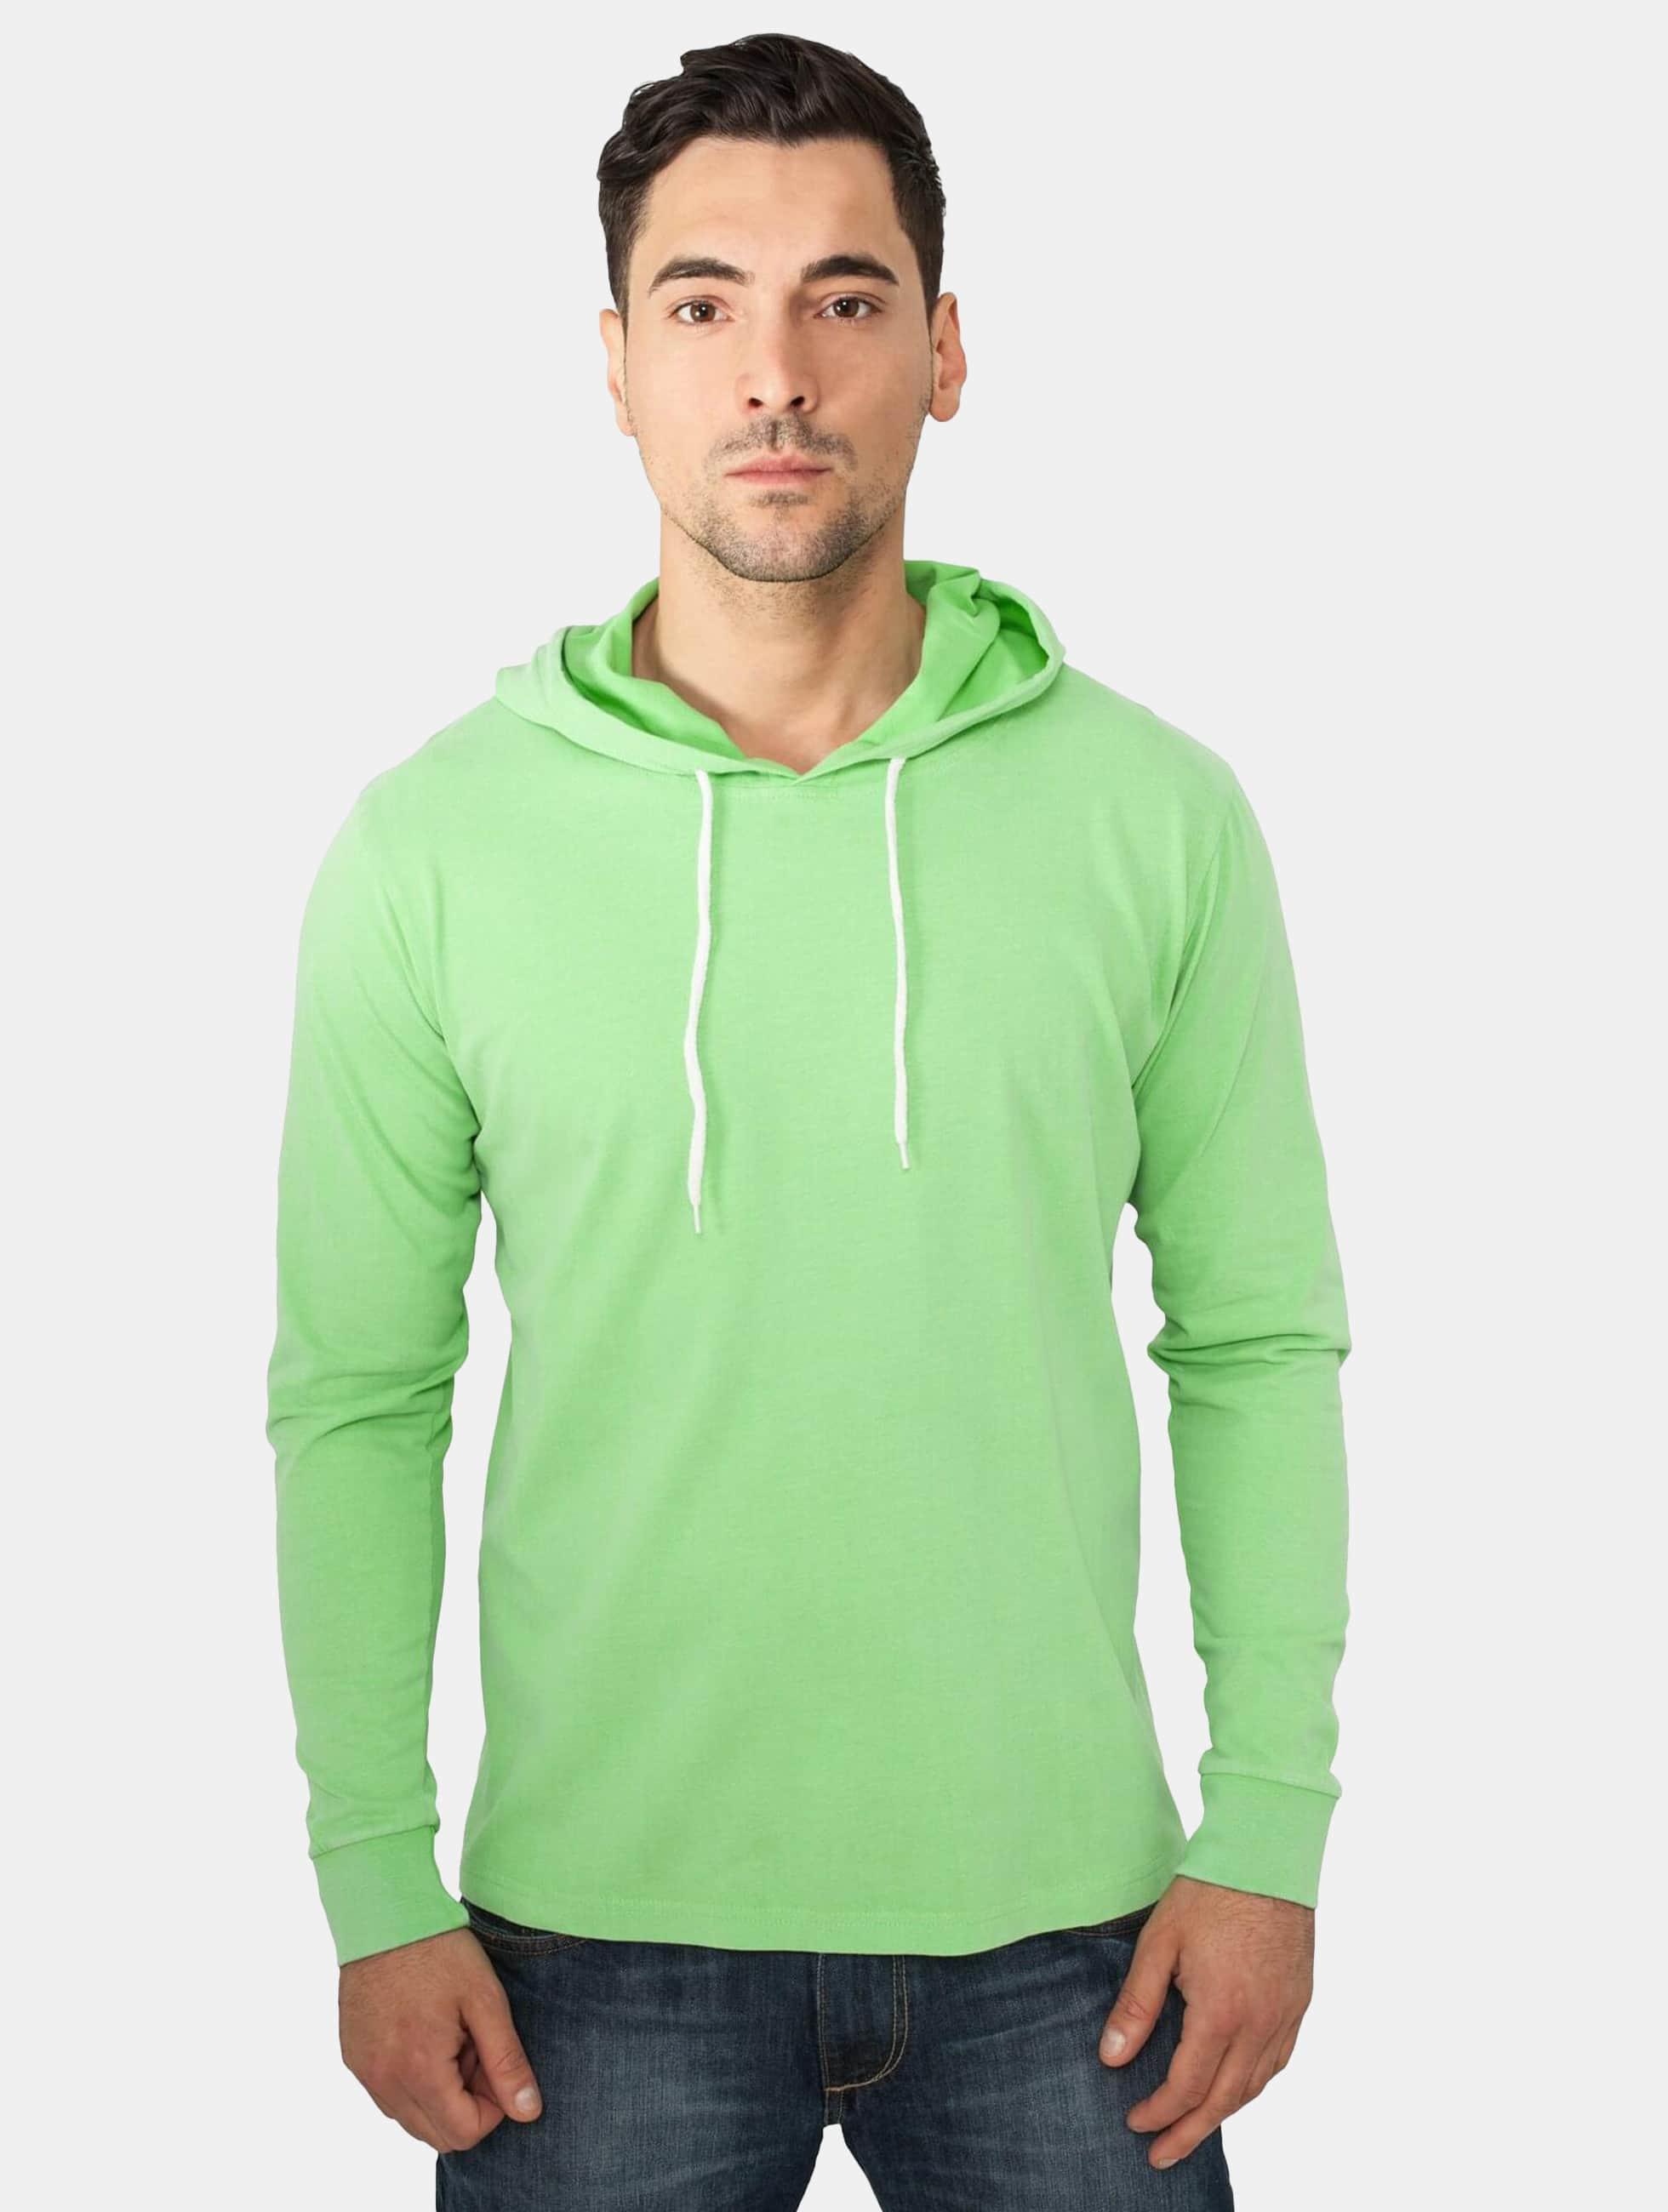 Urban Classics Haut / Sweat à capuche Heavy Peached en vert